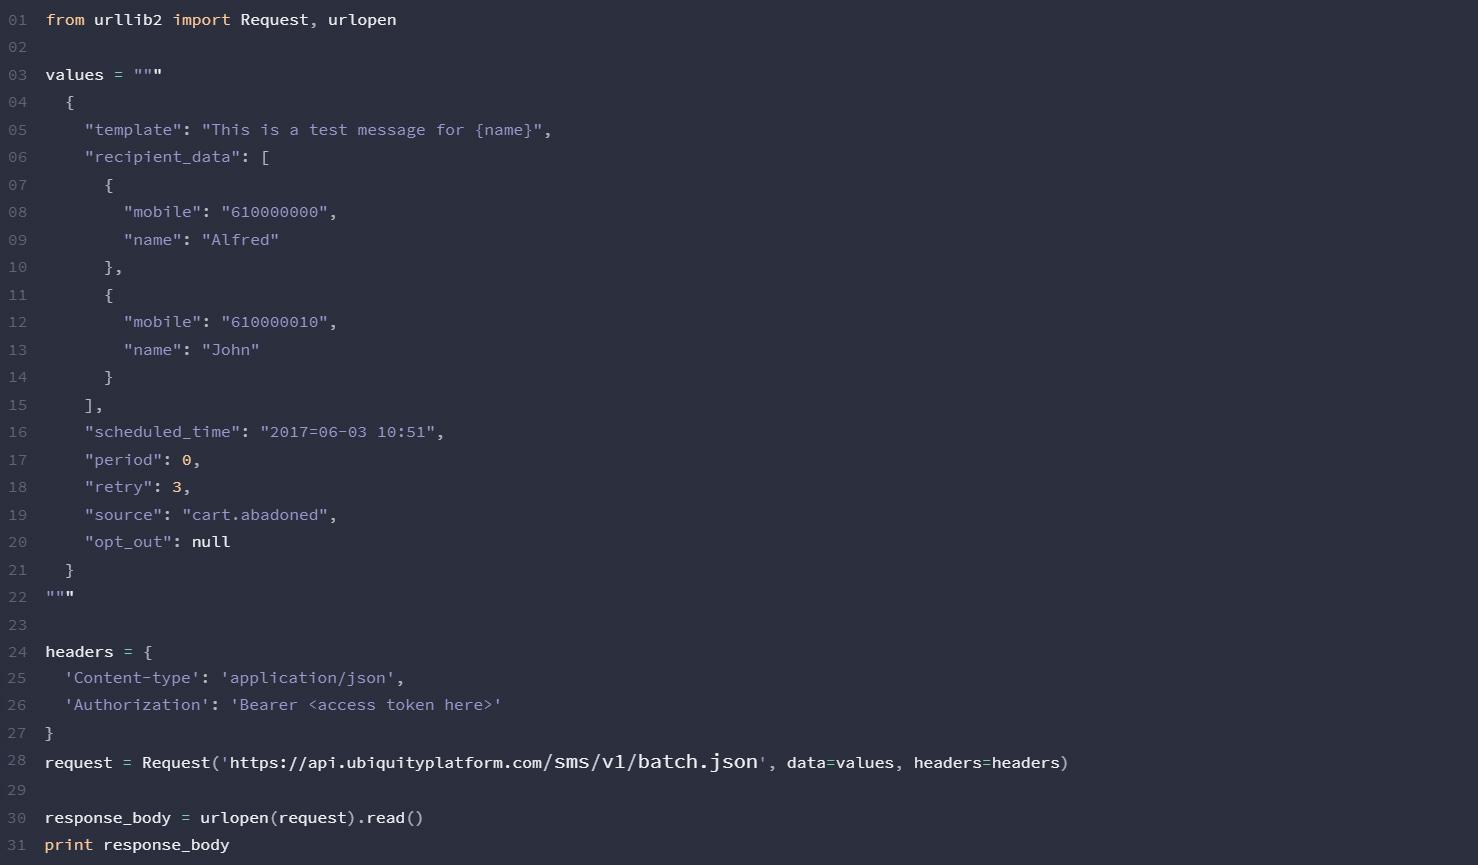 Python-SMS-API-Ubiquity-Platform-Gomeeki